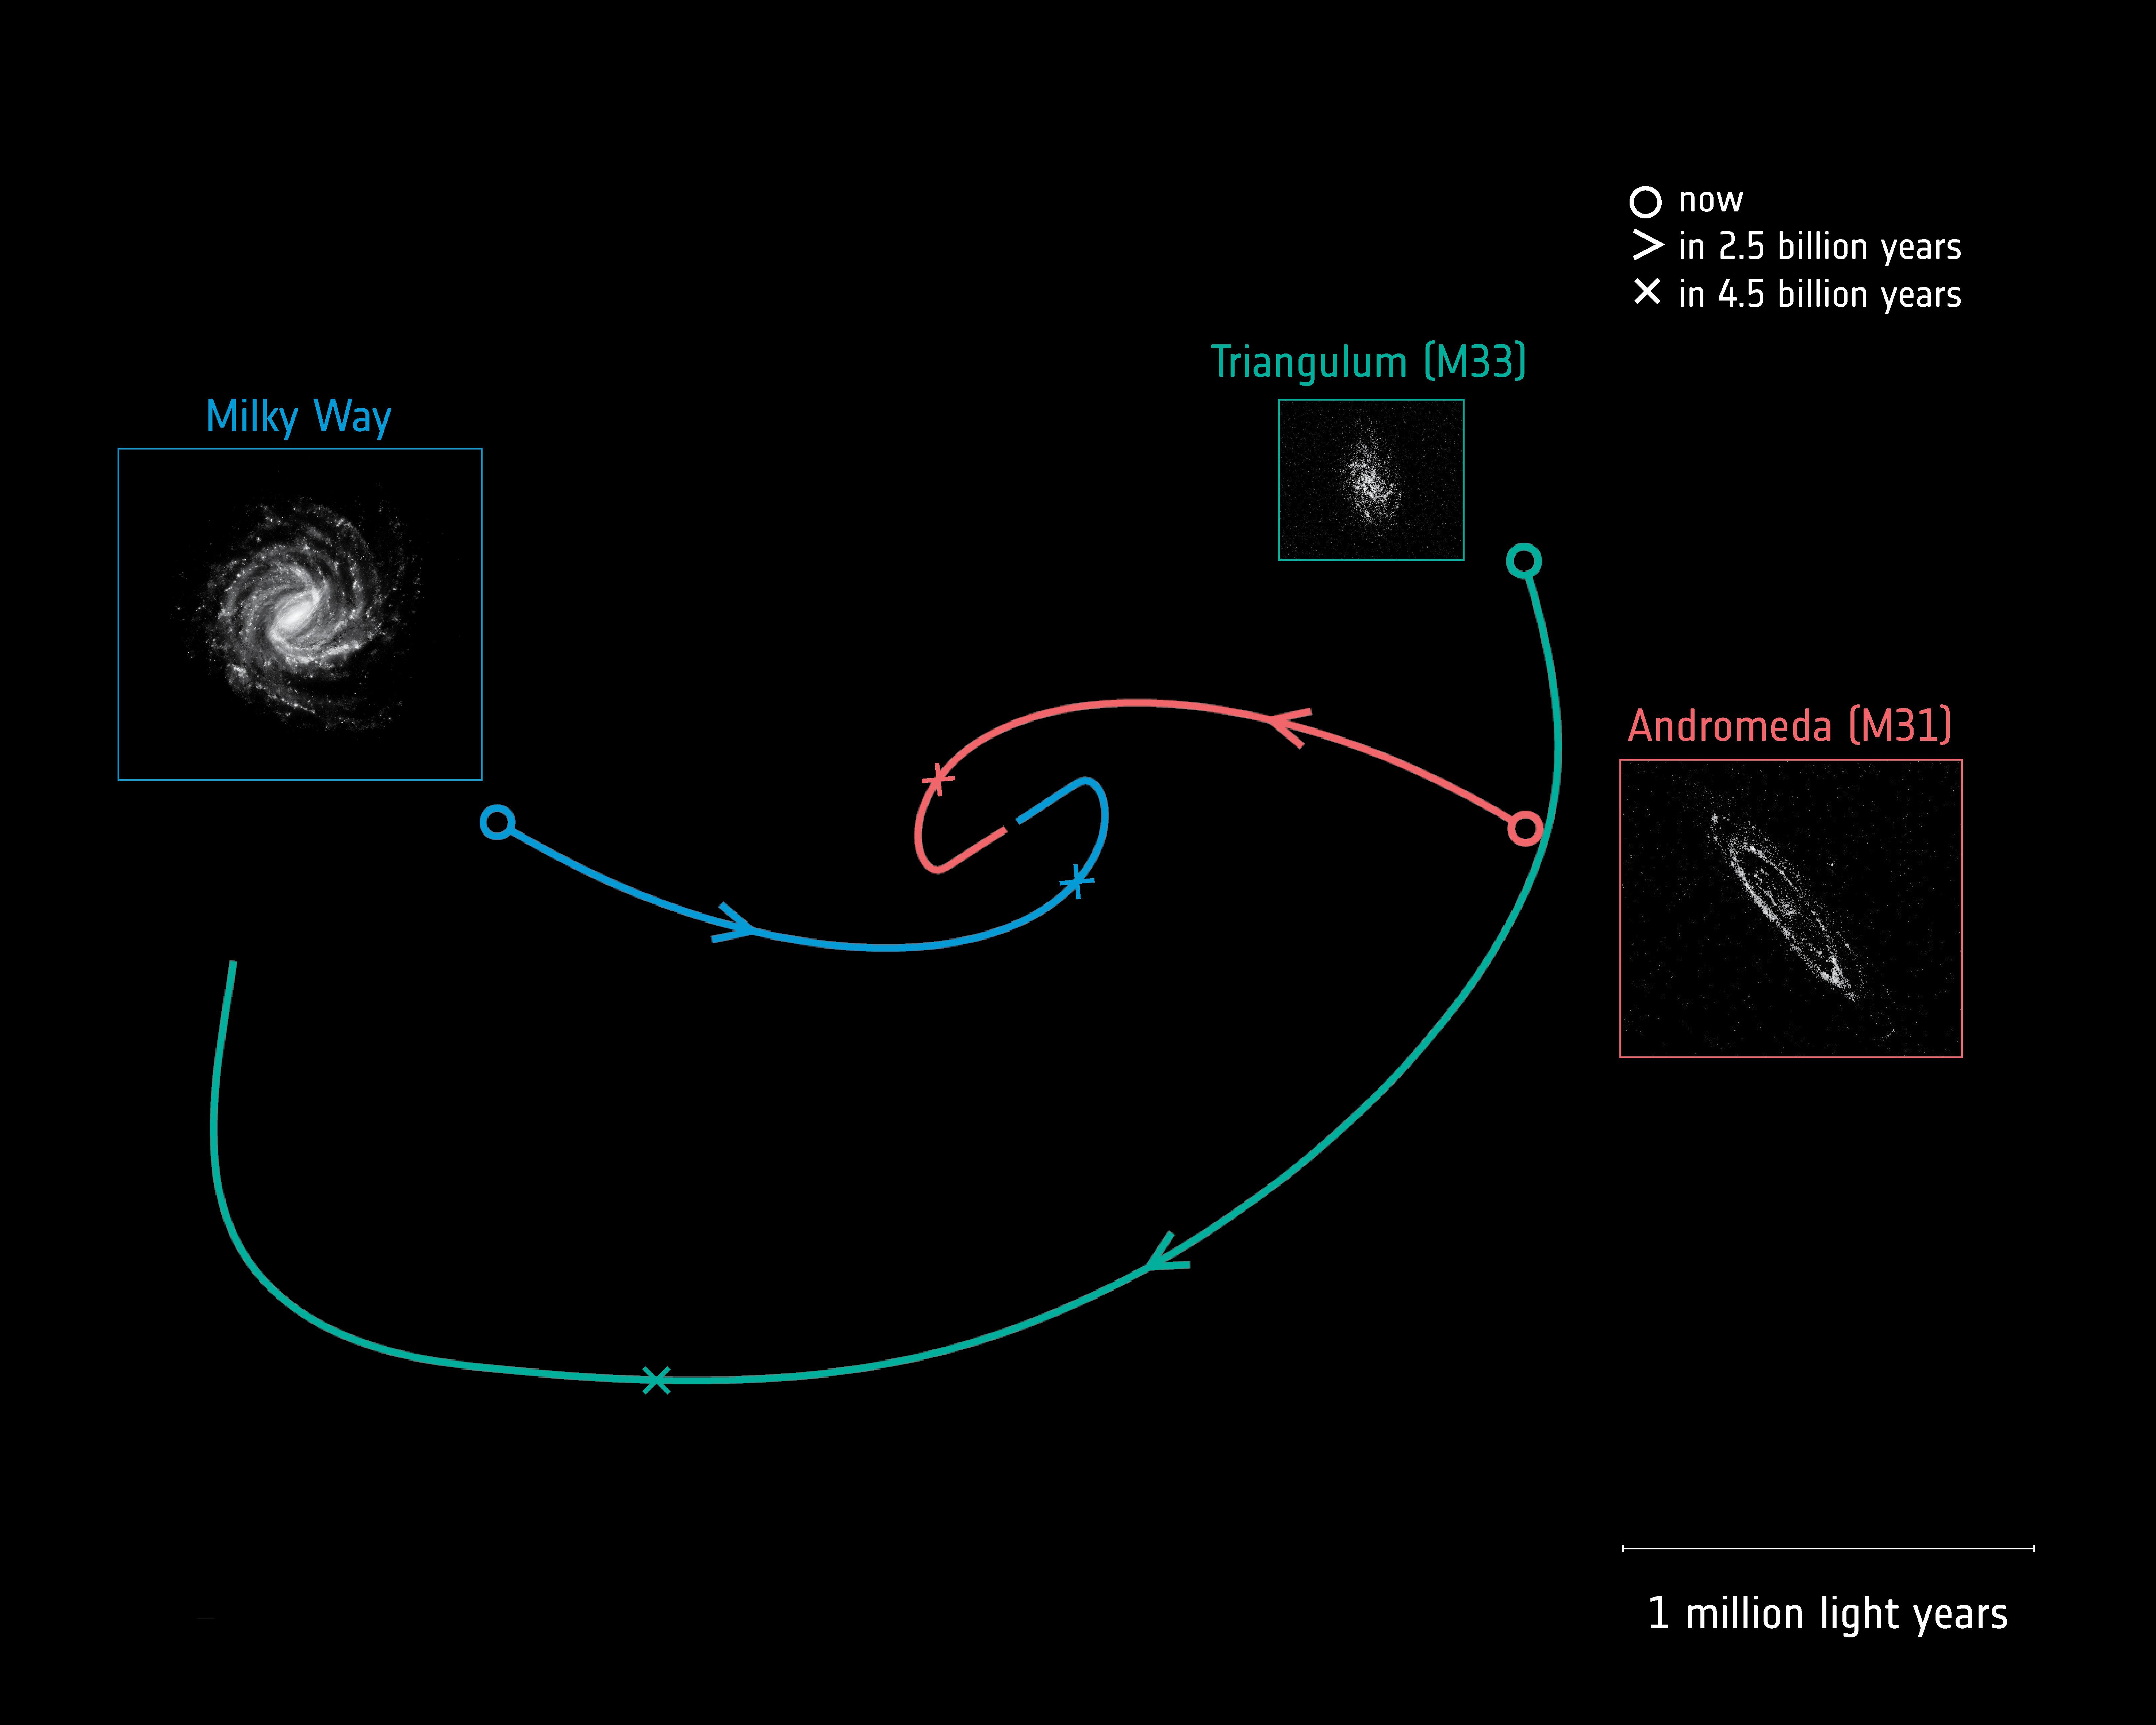 1567214200116-ESA_Gaia_MilkyWayAndromedaTriangulum_trajectories.jpg